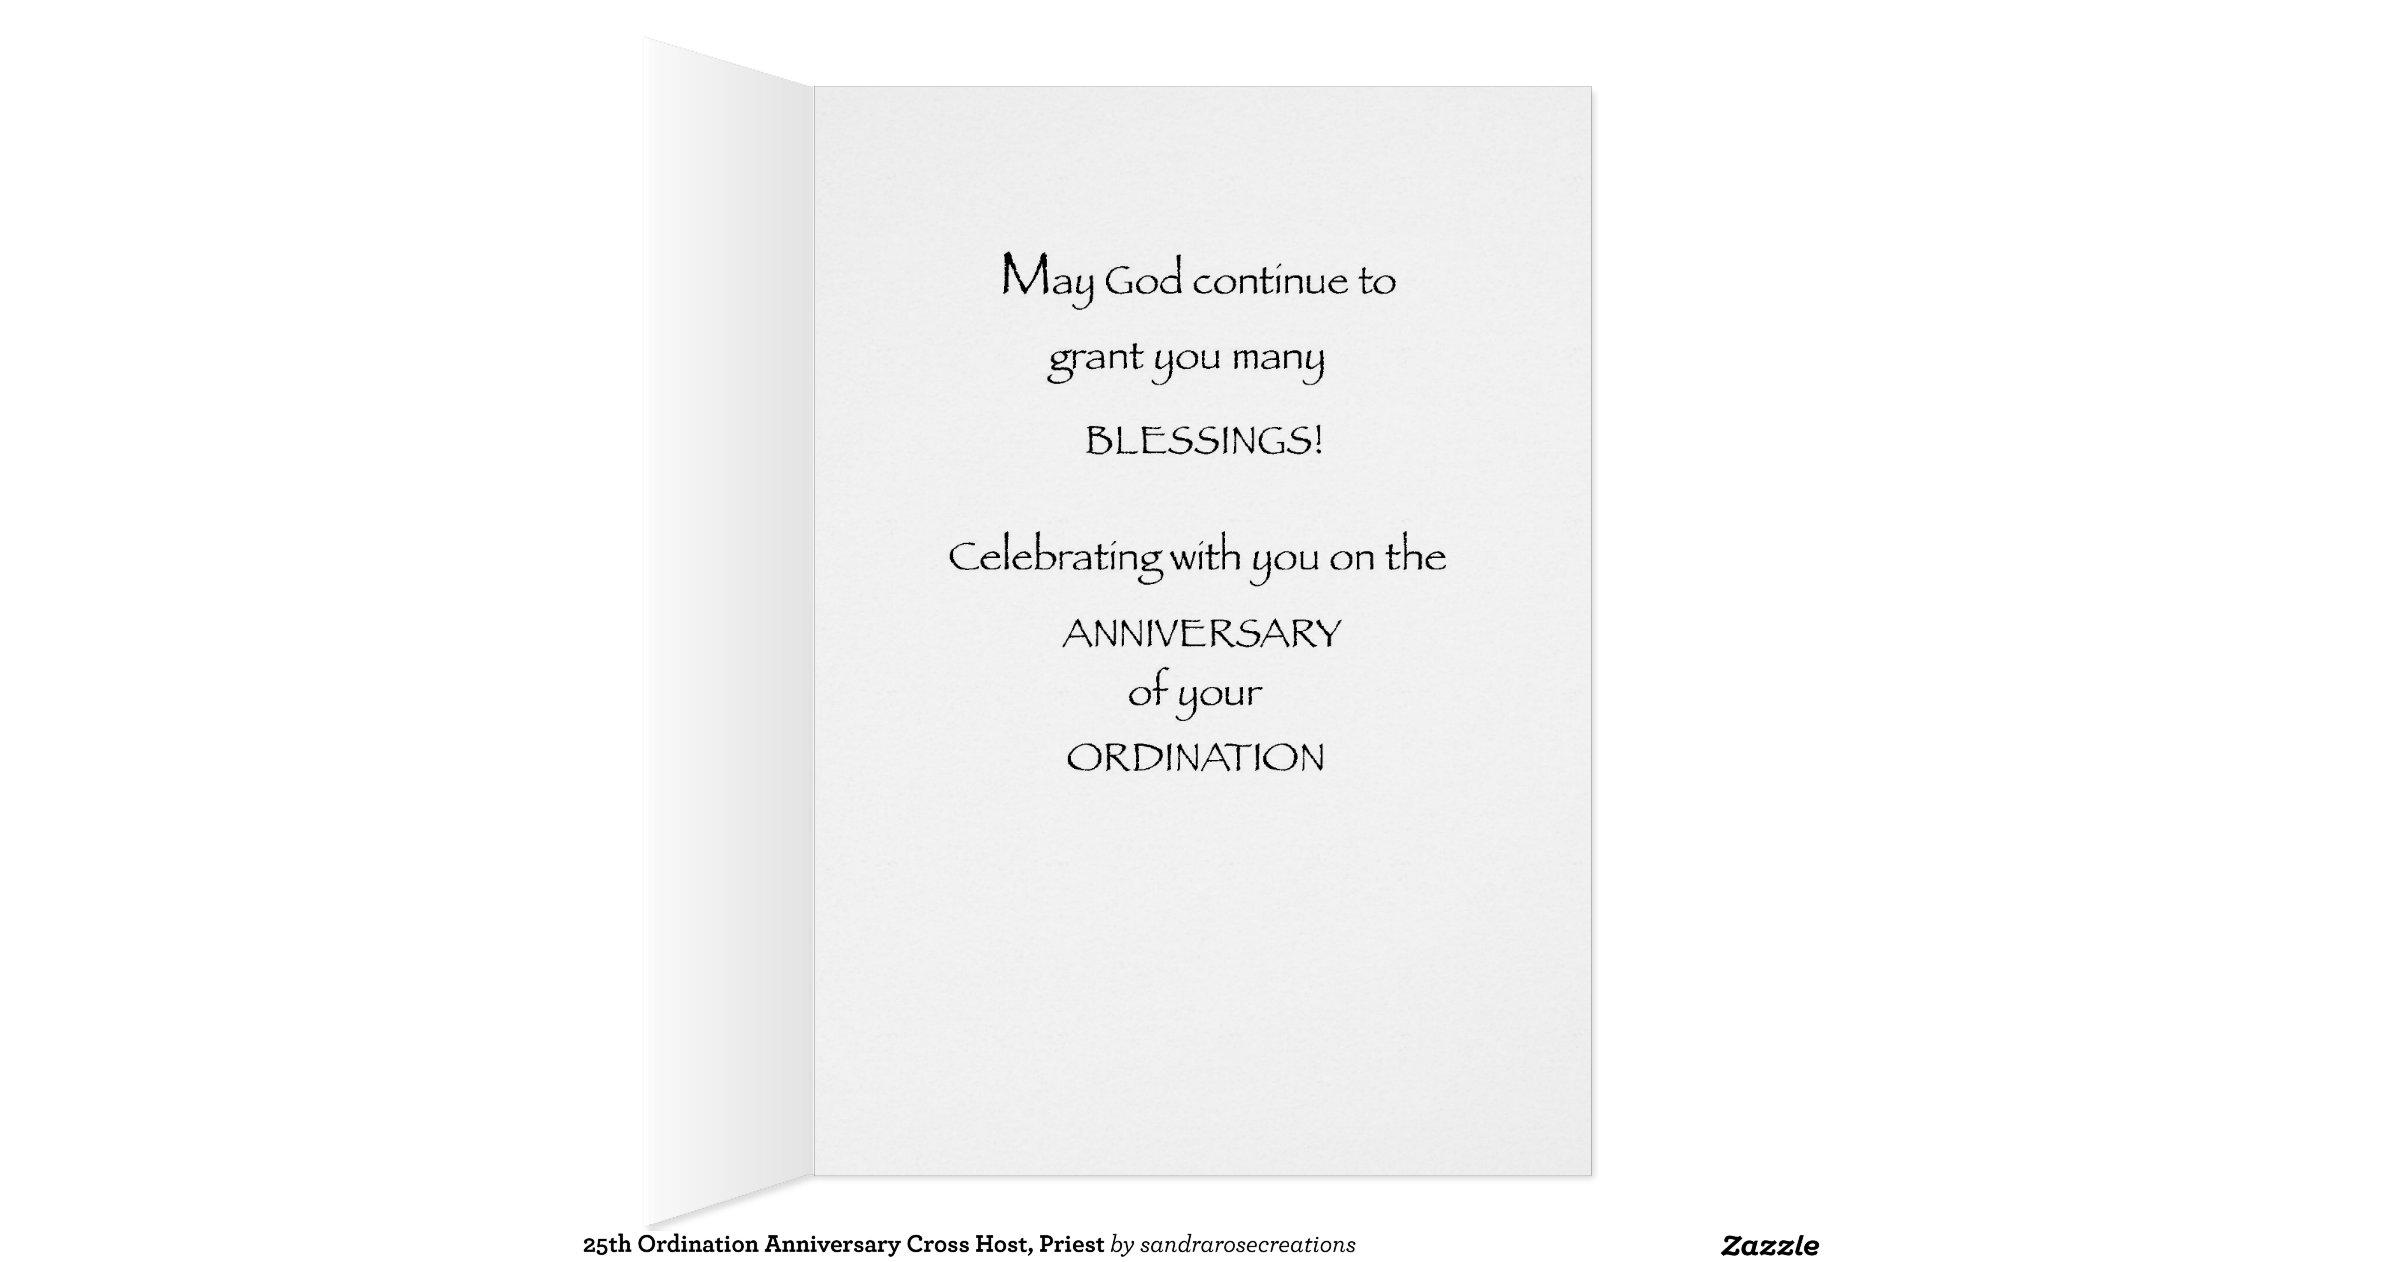 25th_ordination_anniversary_cross_host_priest_stationery